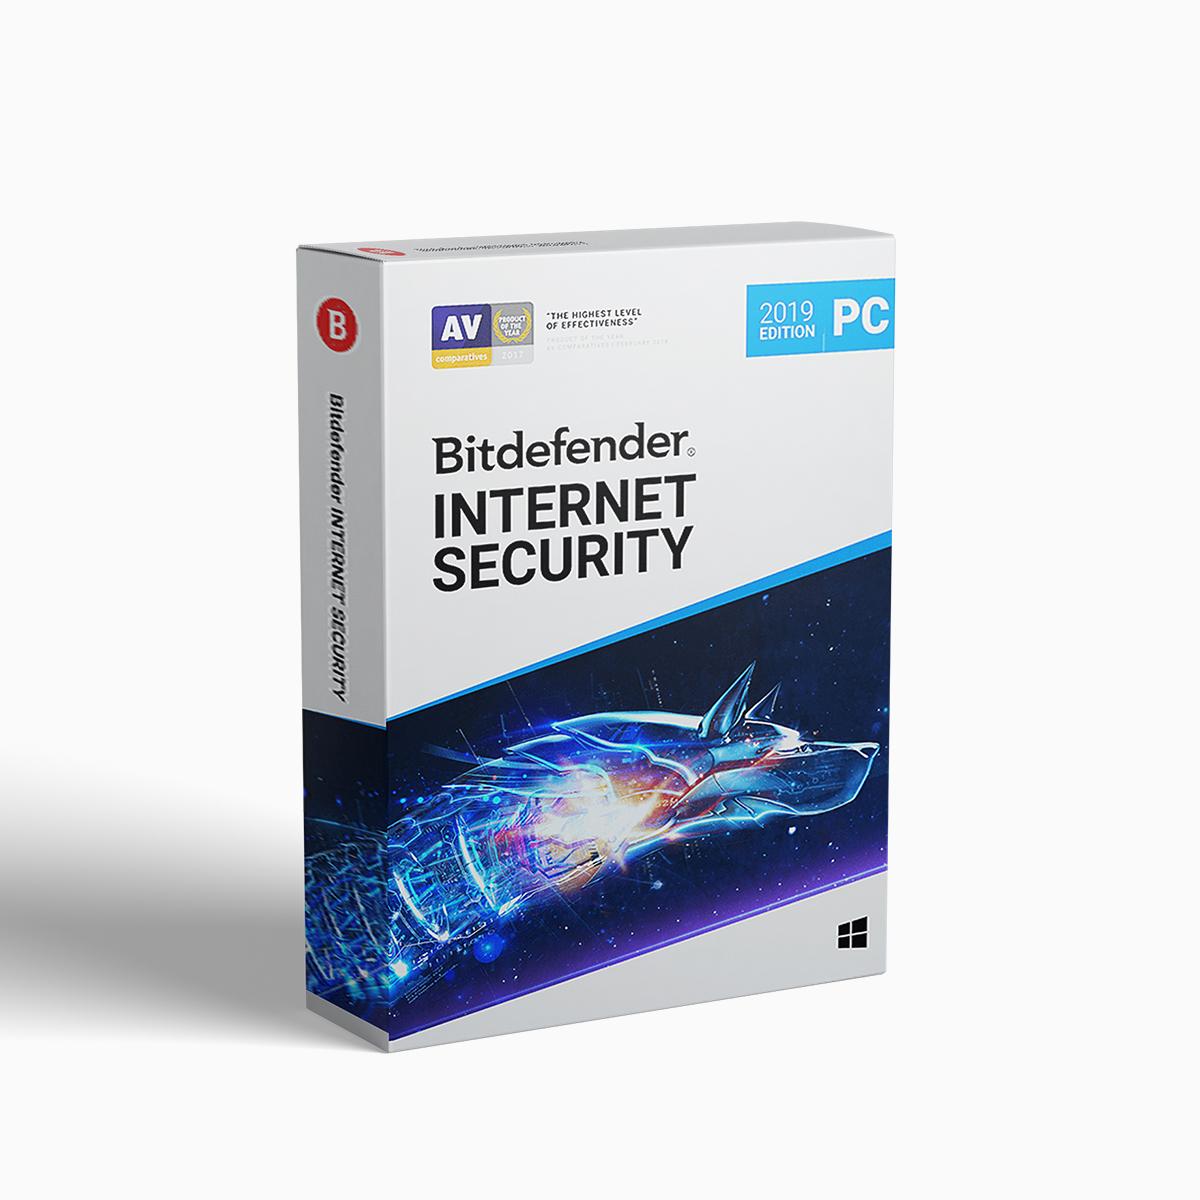 Bitdefender Internet Security (1 user 1 year)